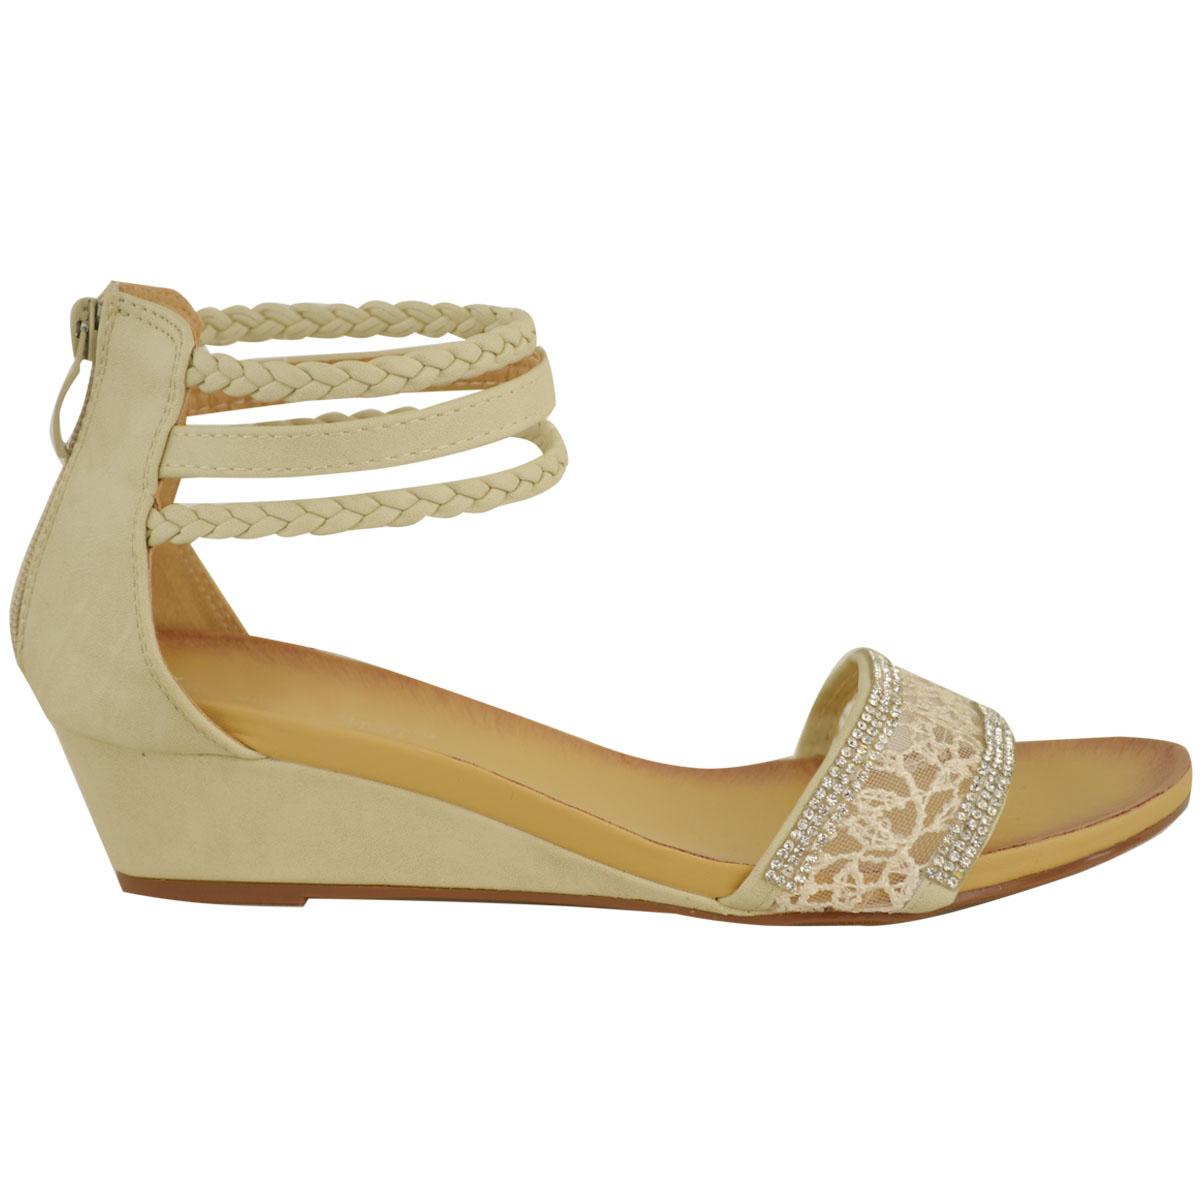 Let Dillard's be you destination for women's low heel pumps.